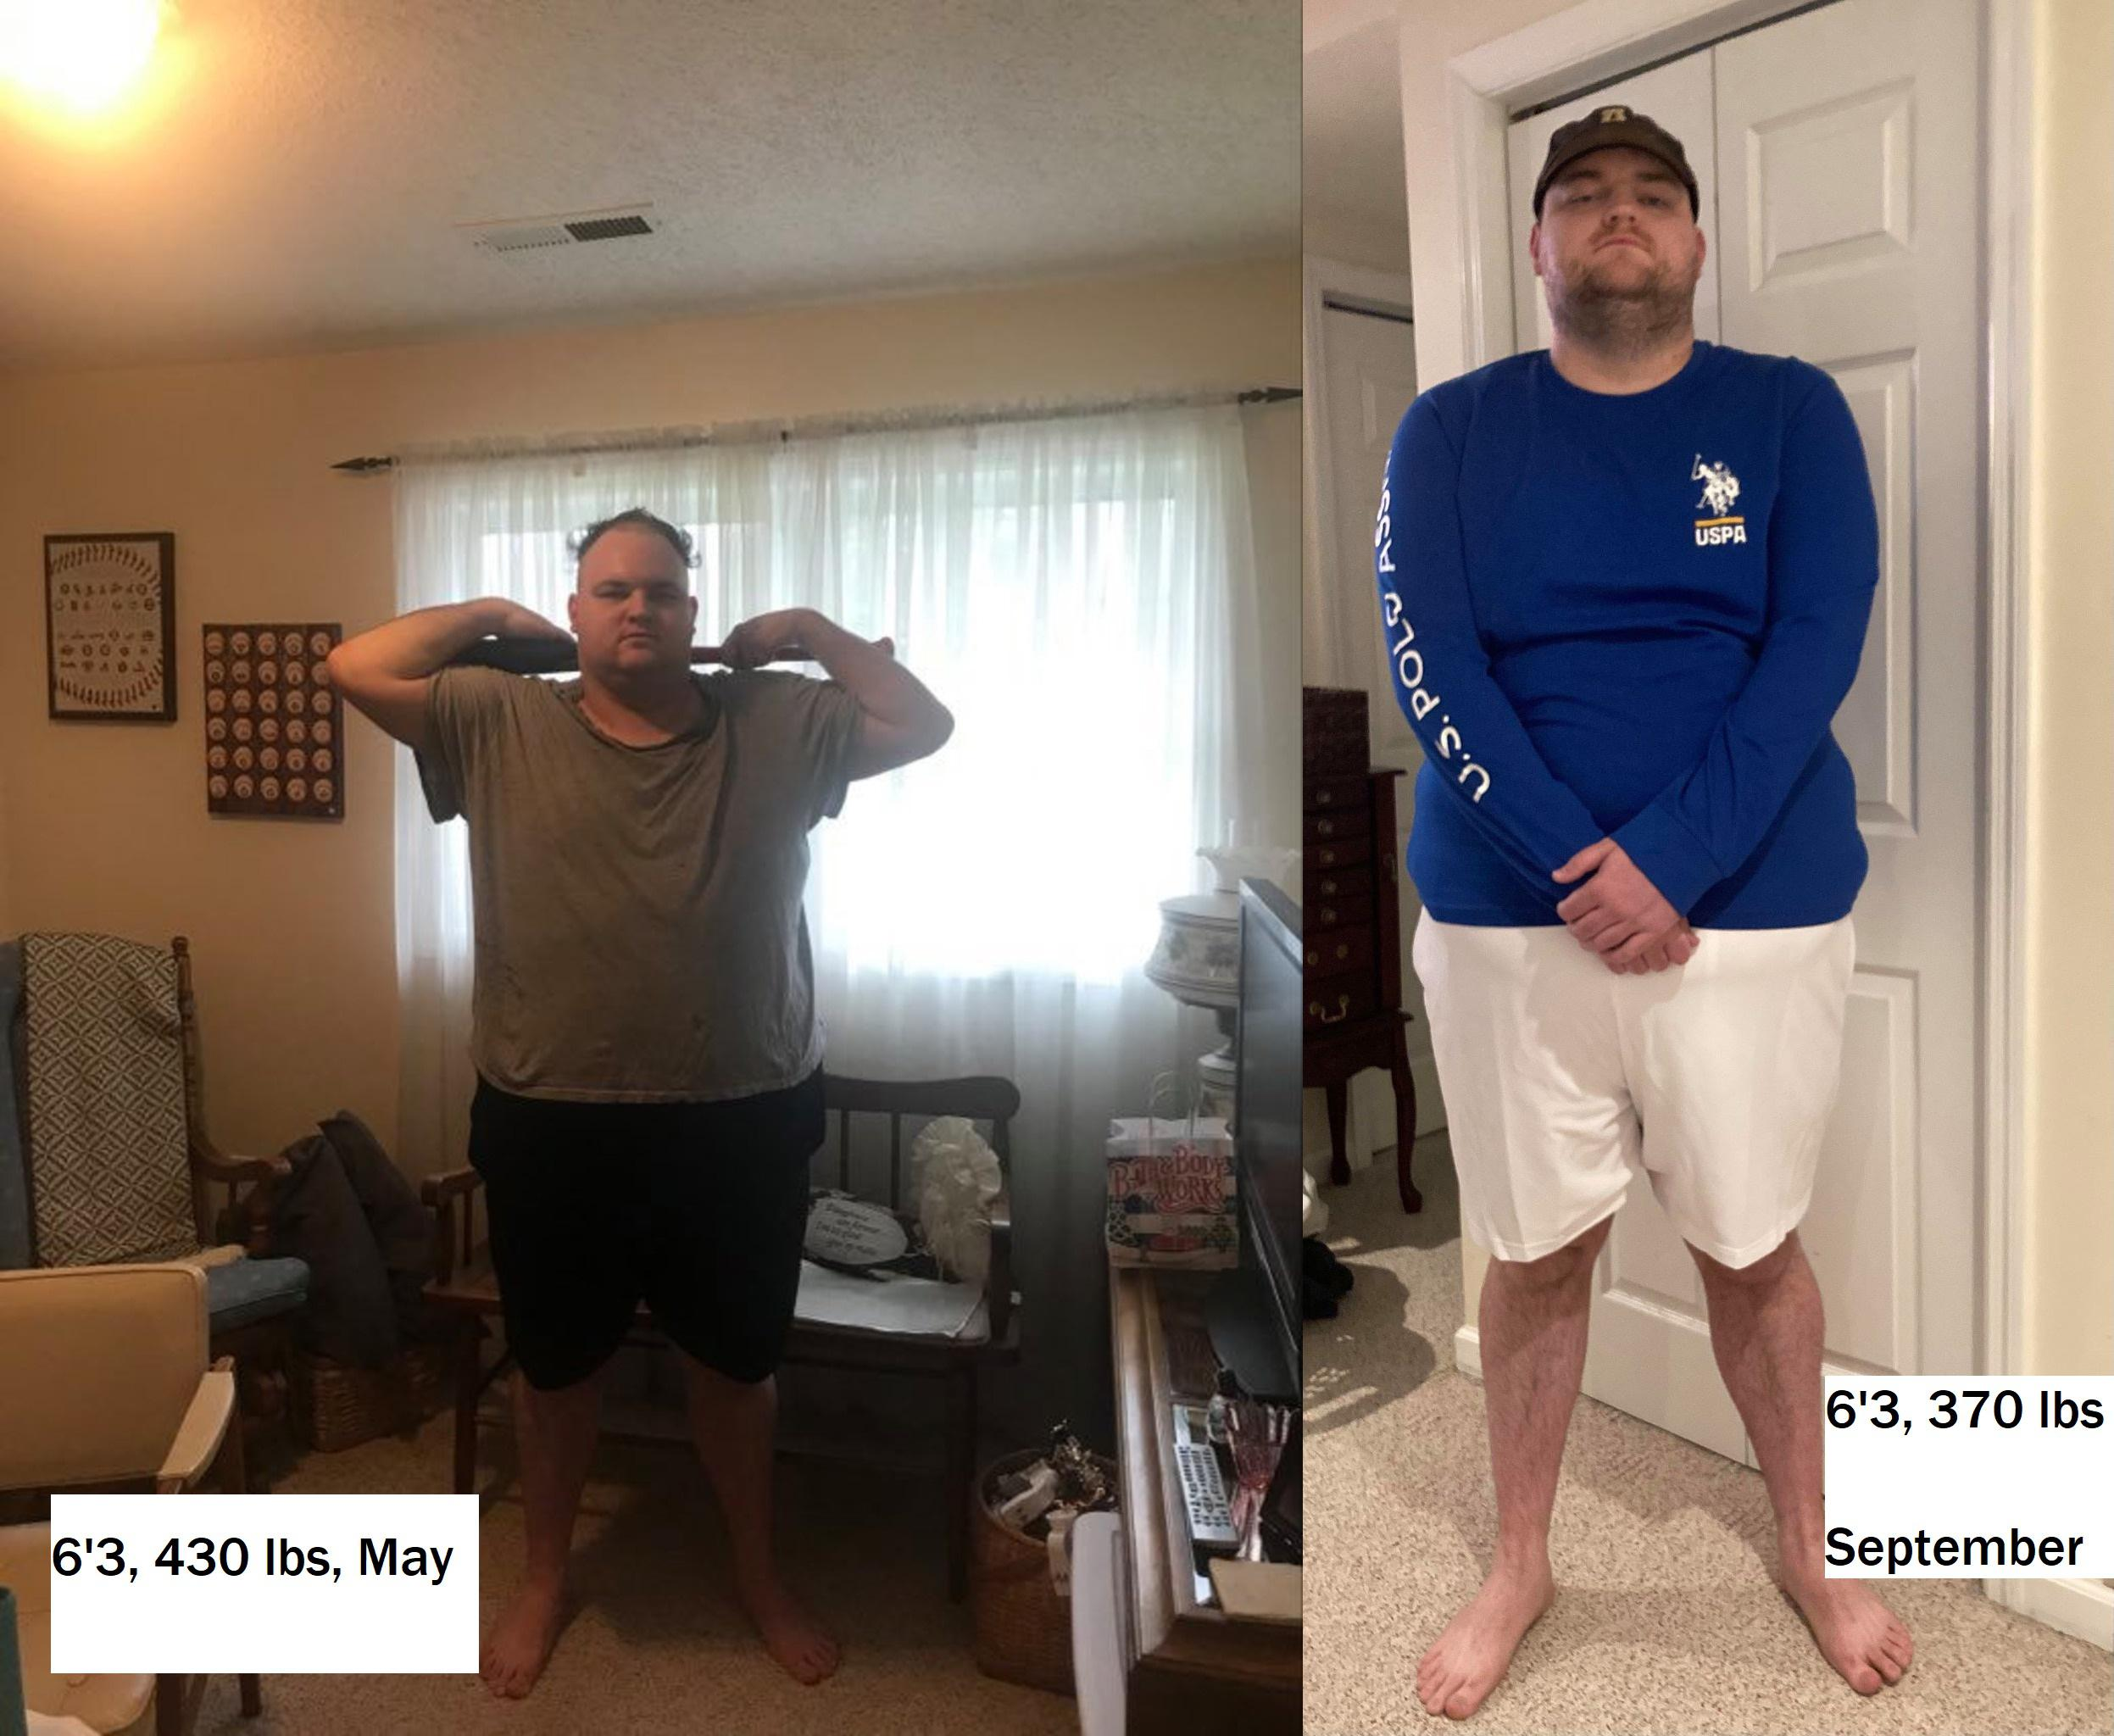 60 lbs Fat Loss 6 foot 3 Male 430 lbs to 370 lbs